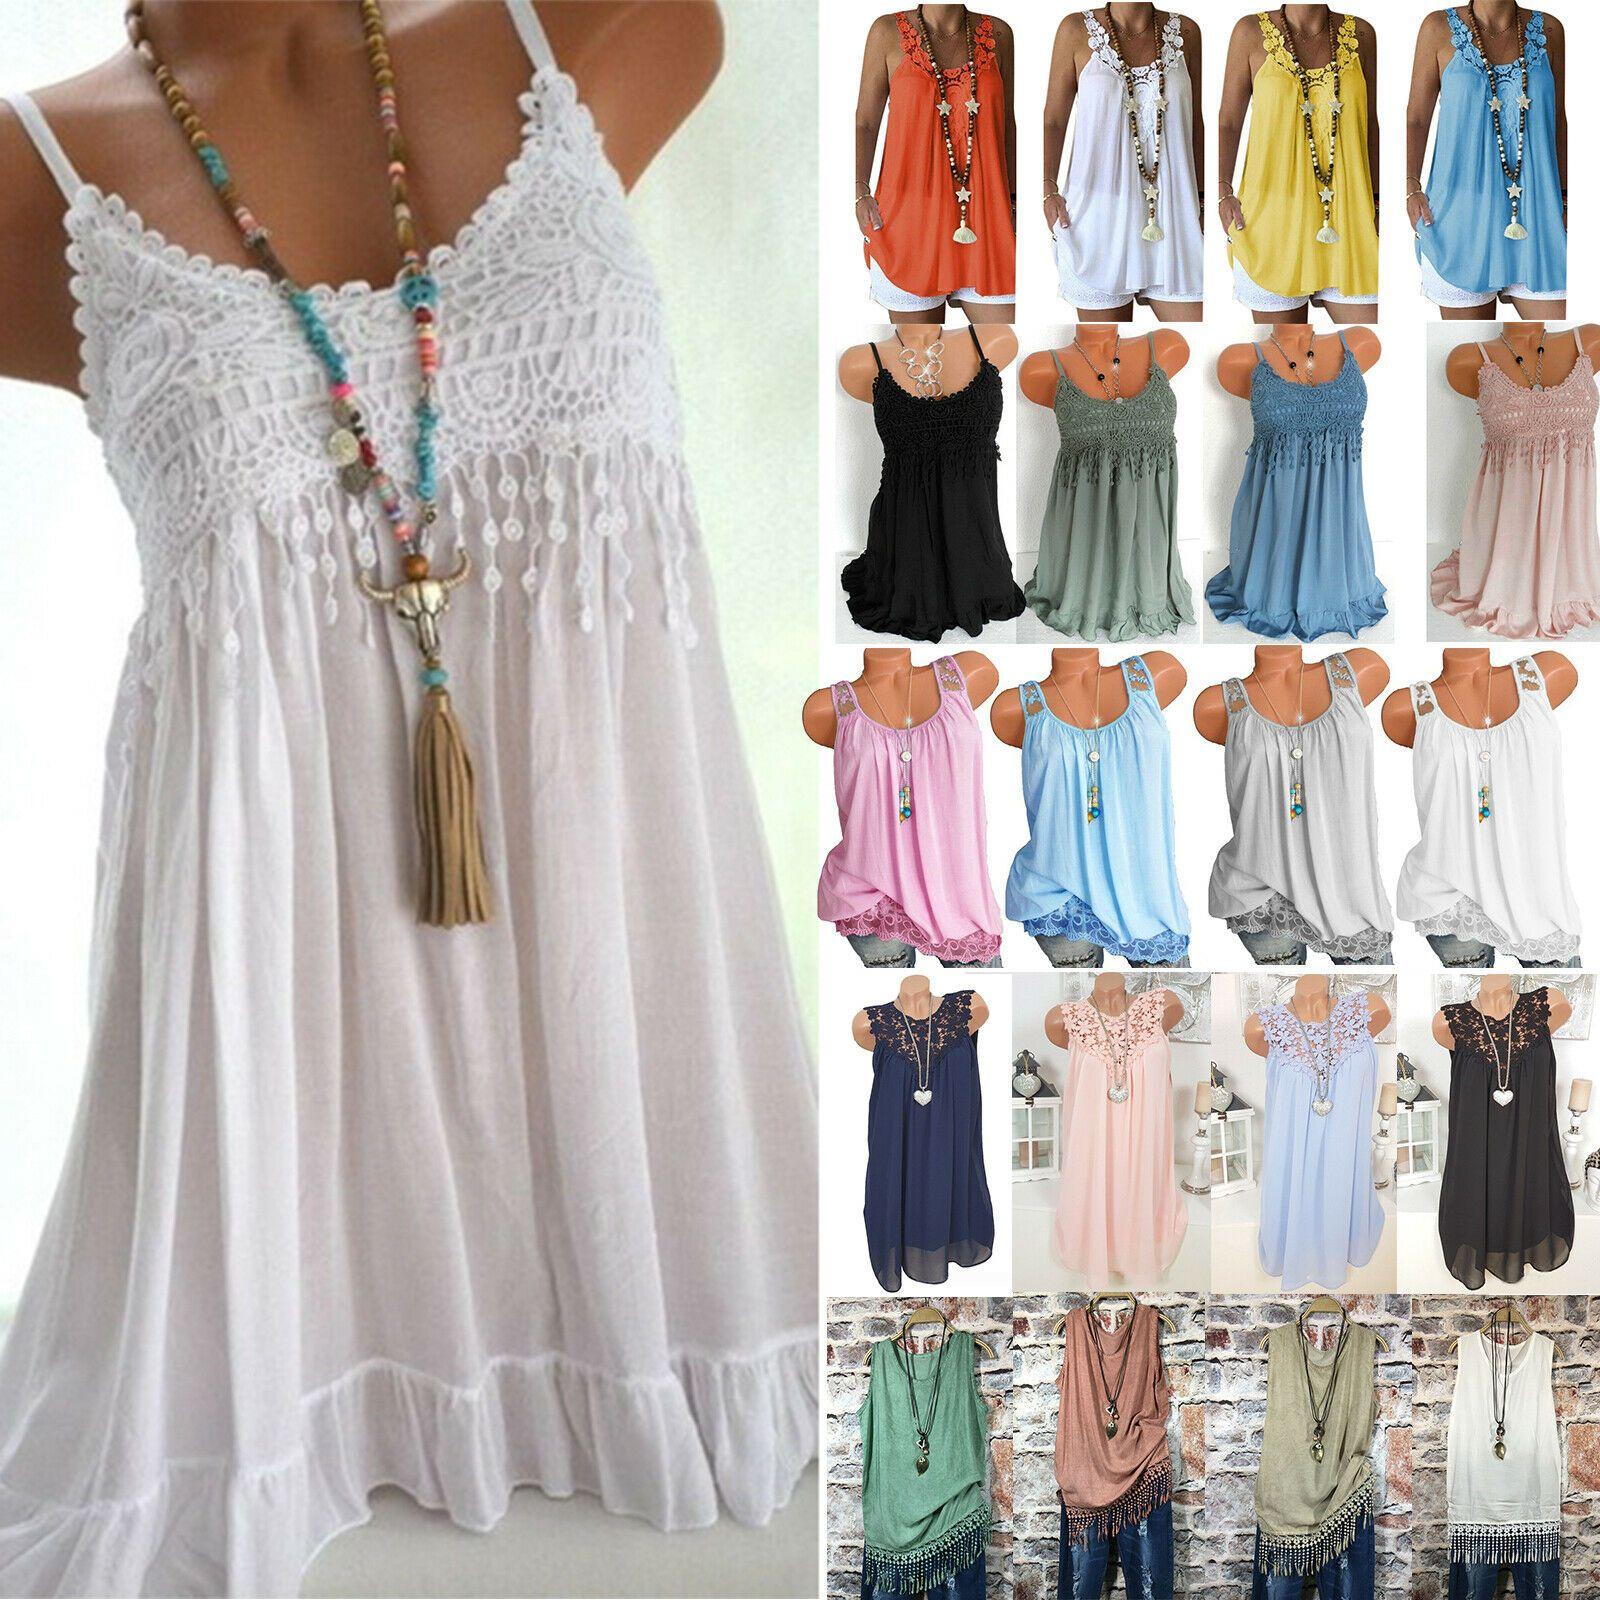 Womens Summer Tank Top Lace Loose Tunic Beach Bikini Cover Up Kaftan Mini Dress White Dresses Long Summer Dresses Maxi Ladies Mini Dresses Maxi Dress Evening [ 1600 x 1600 Pixel ]